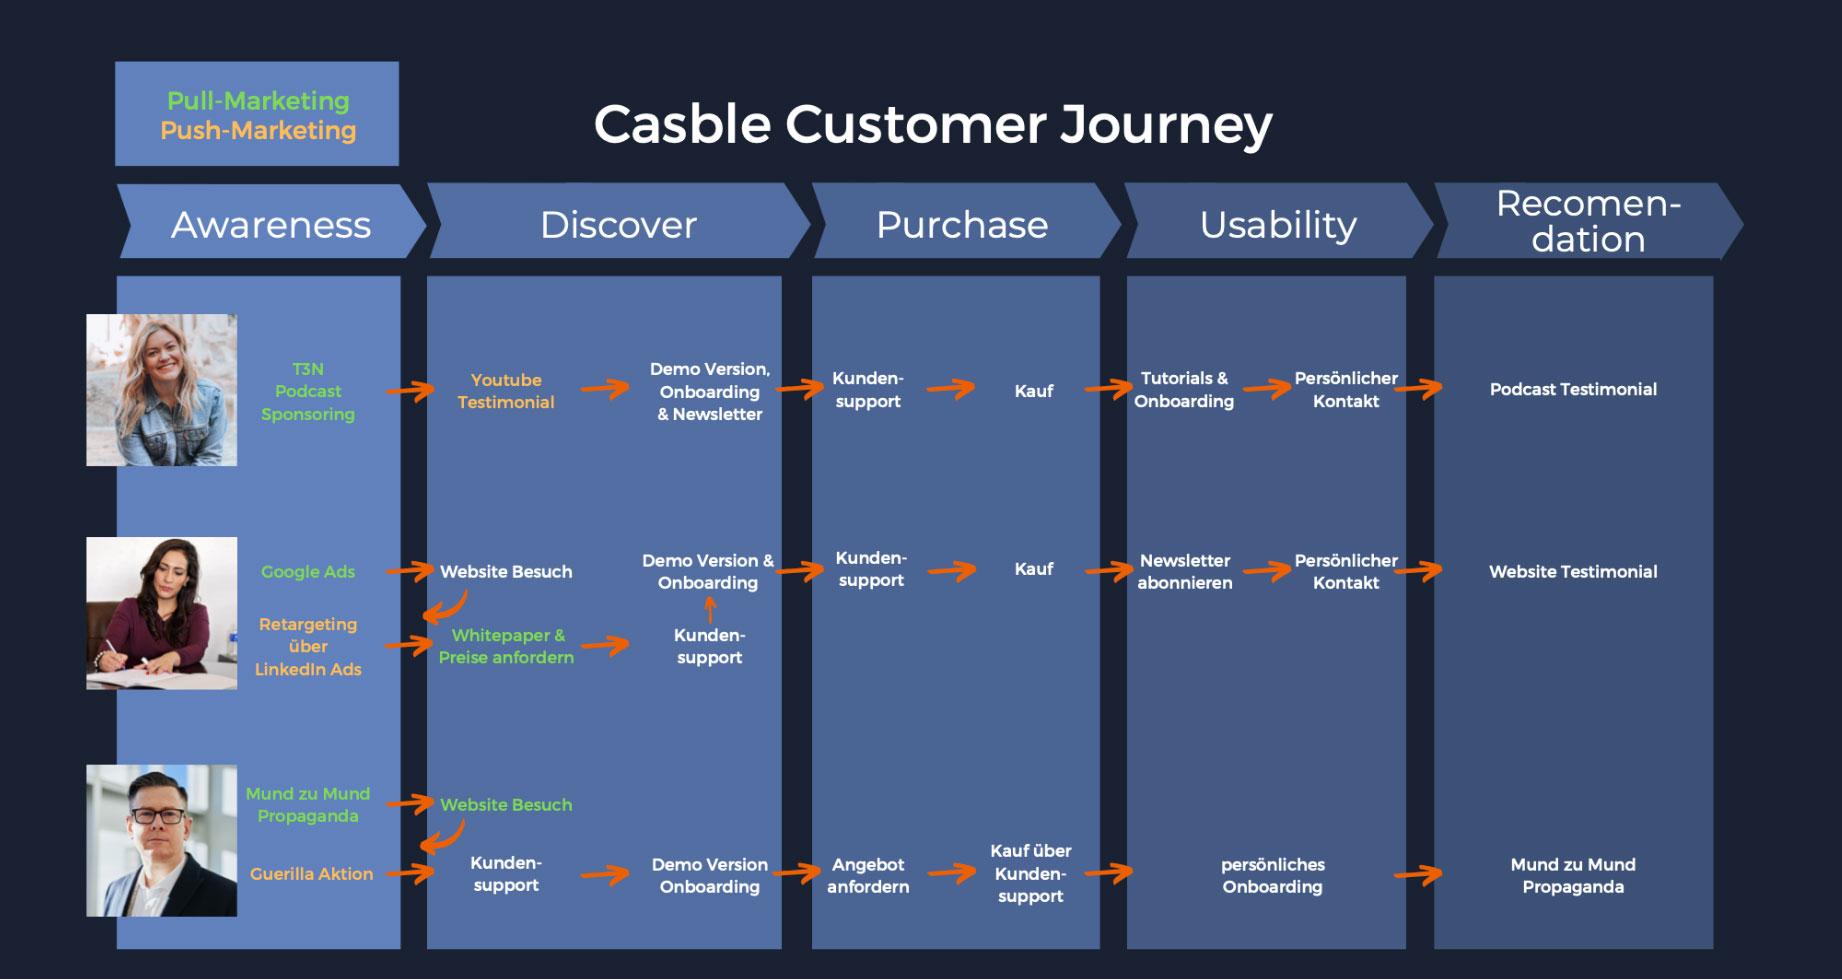 Casble Customer Journey - B2B-Marketing-Funnel